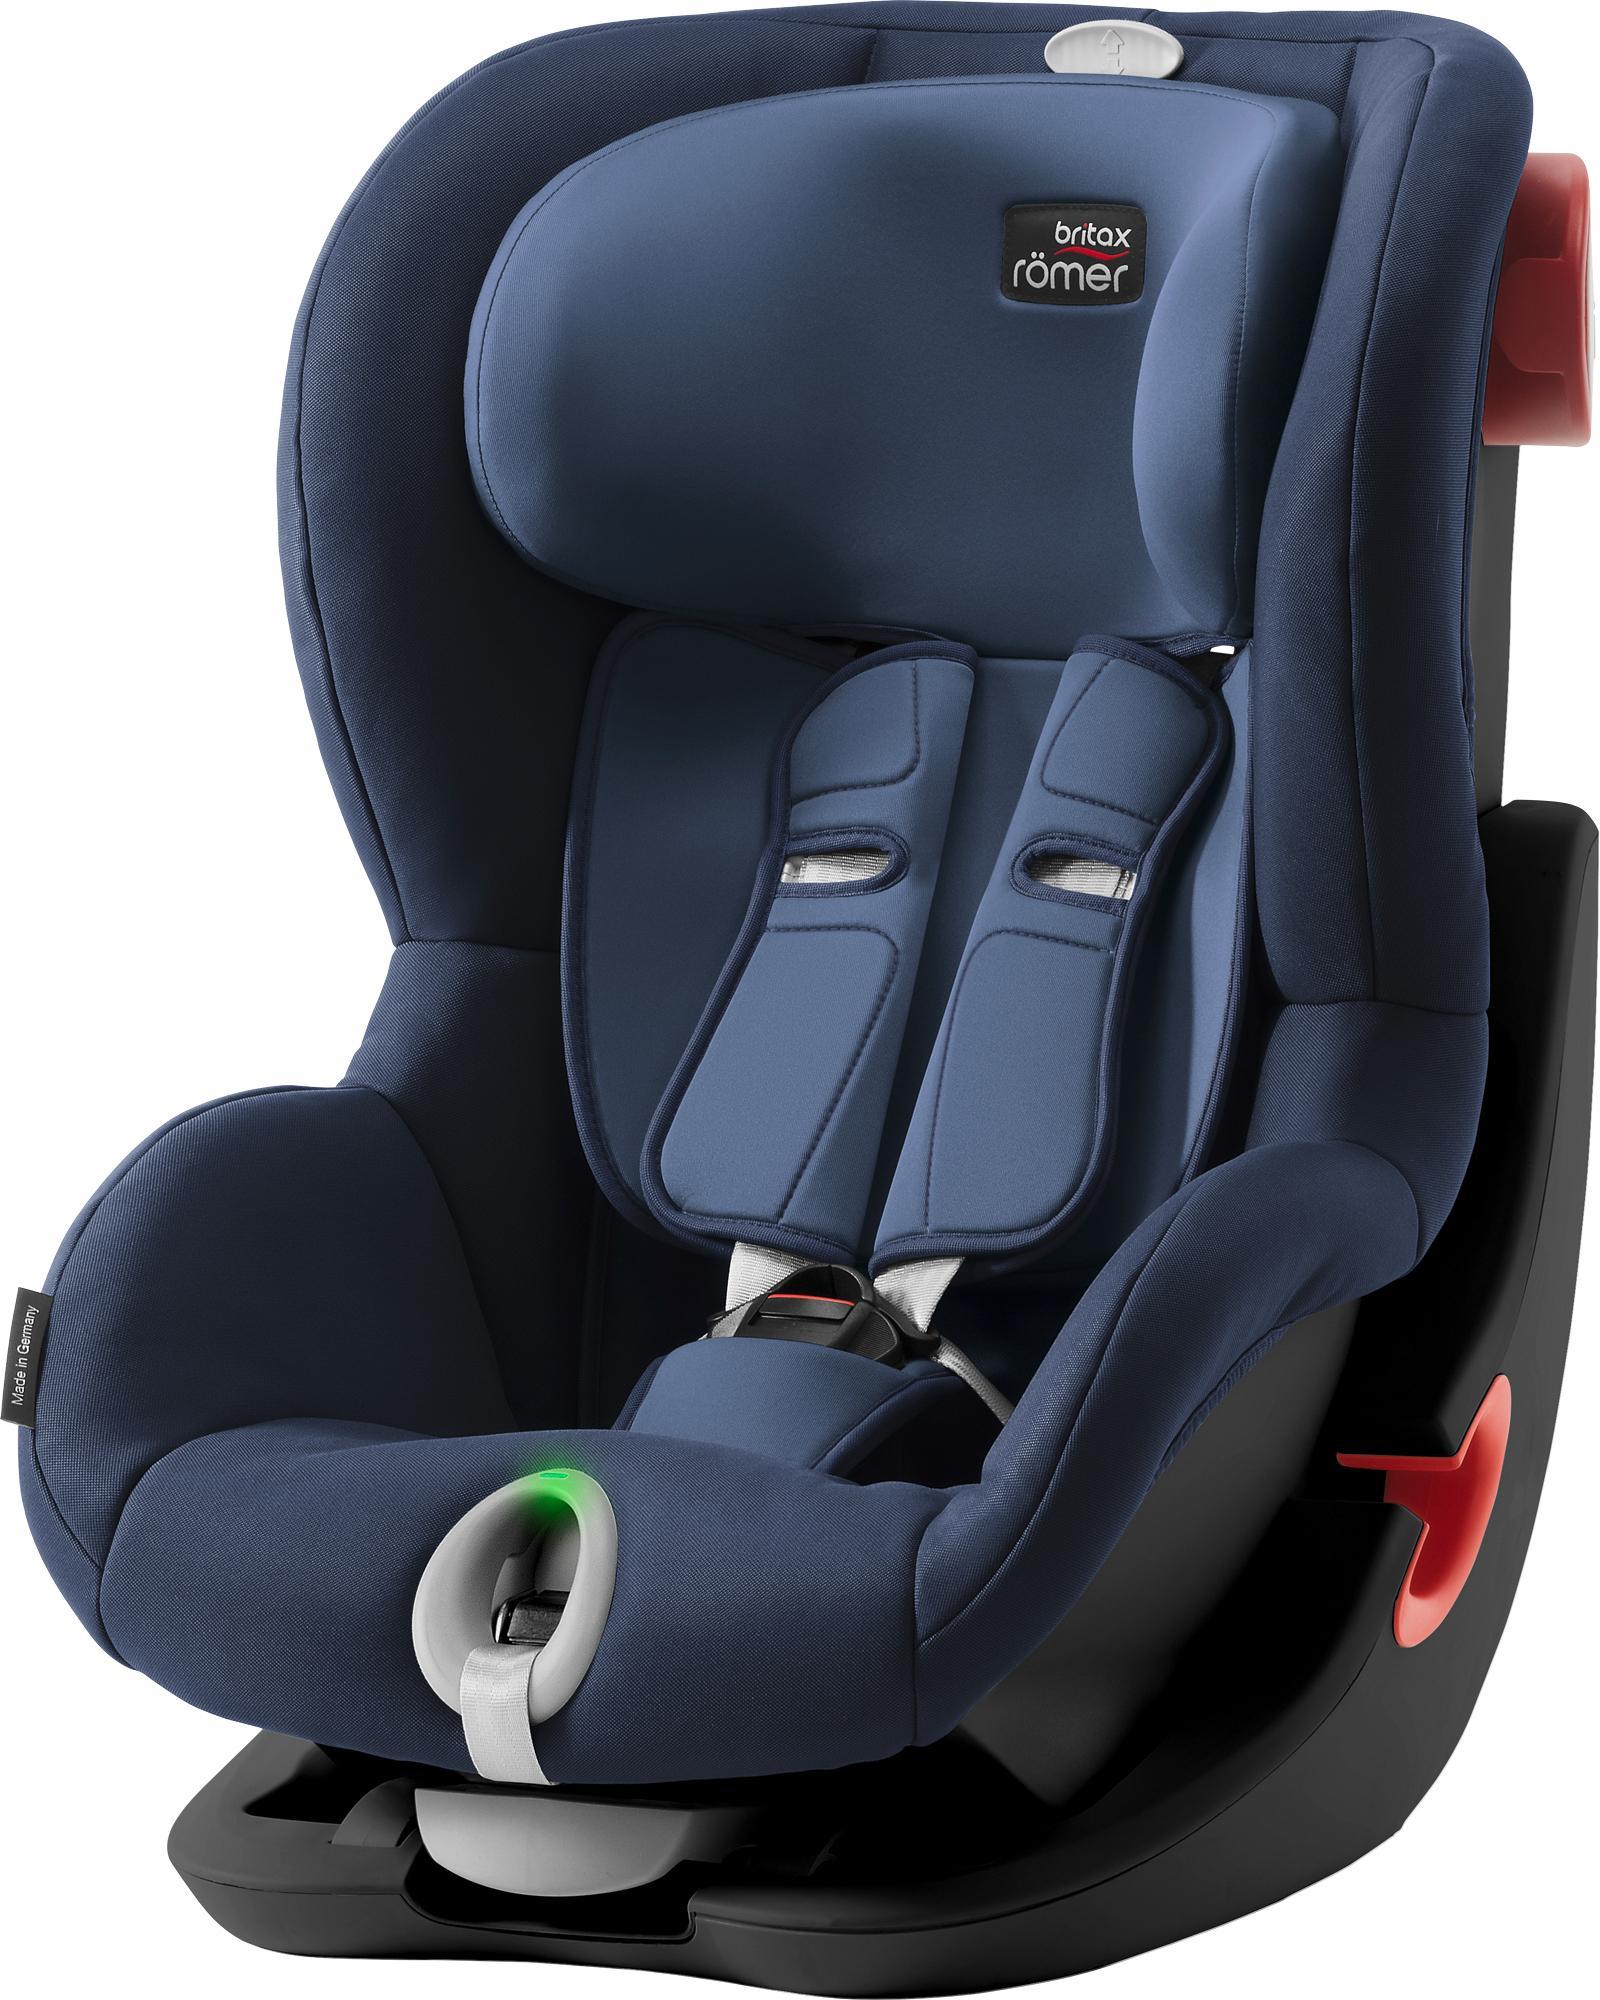 Britax Advocate G41 Convertible Car Seat Manhattan